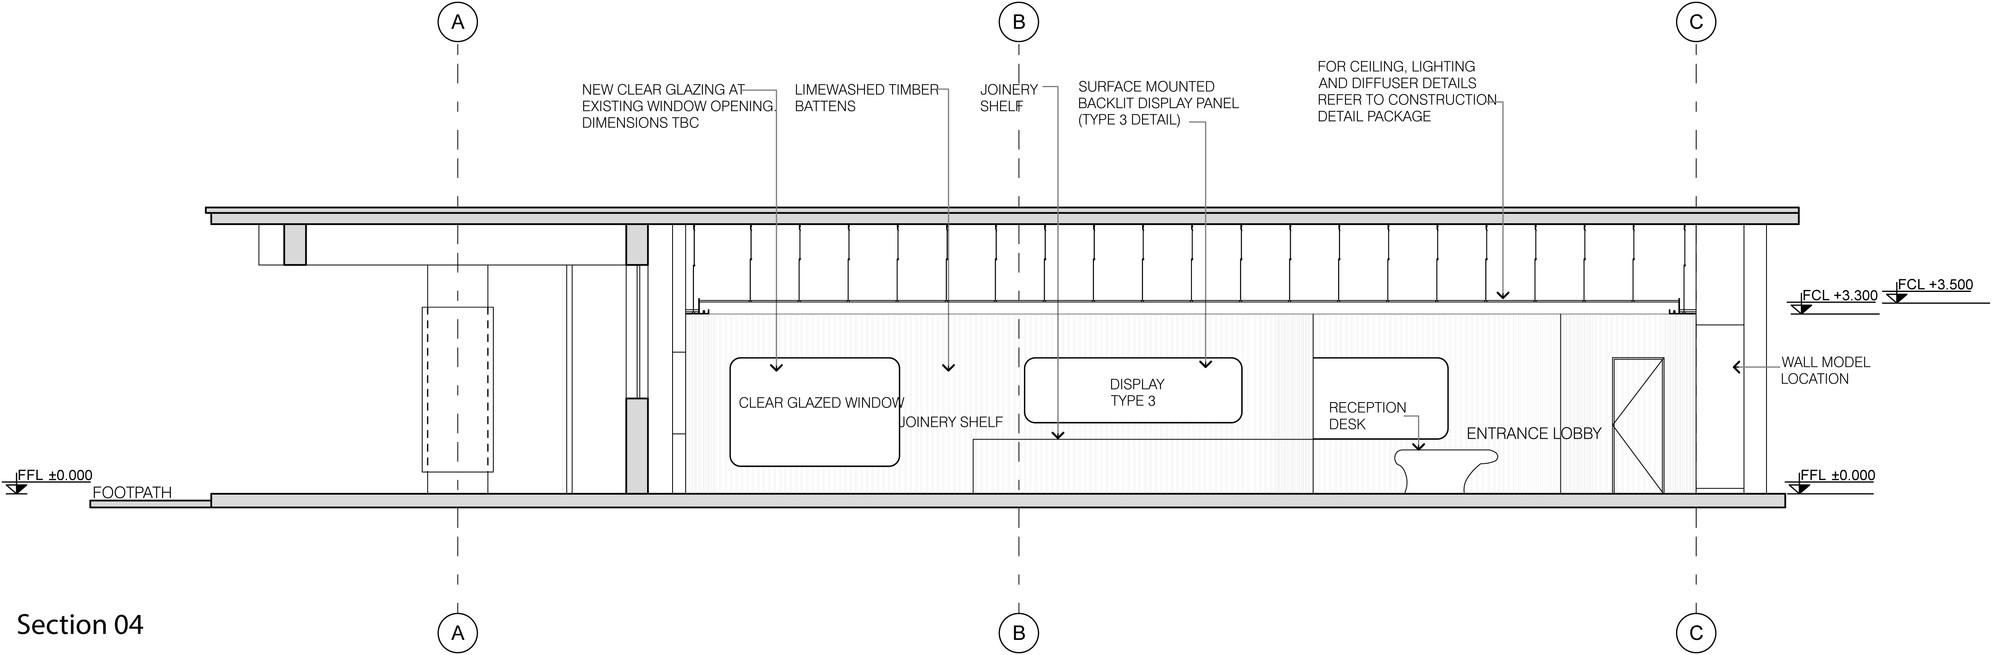 small resolution of gallery of sydney greenland centre marketing suite ptw lava 16 skoda work manuals u003e fabia skoda felicia ignition switch wiring diagram